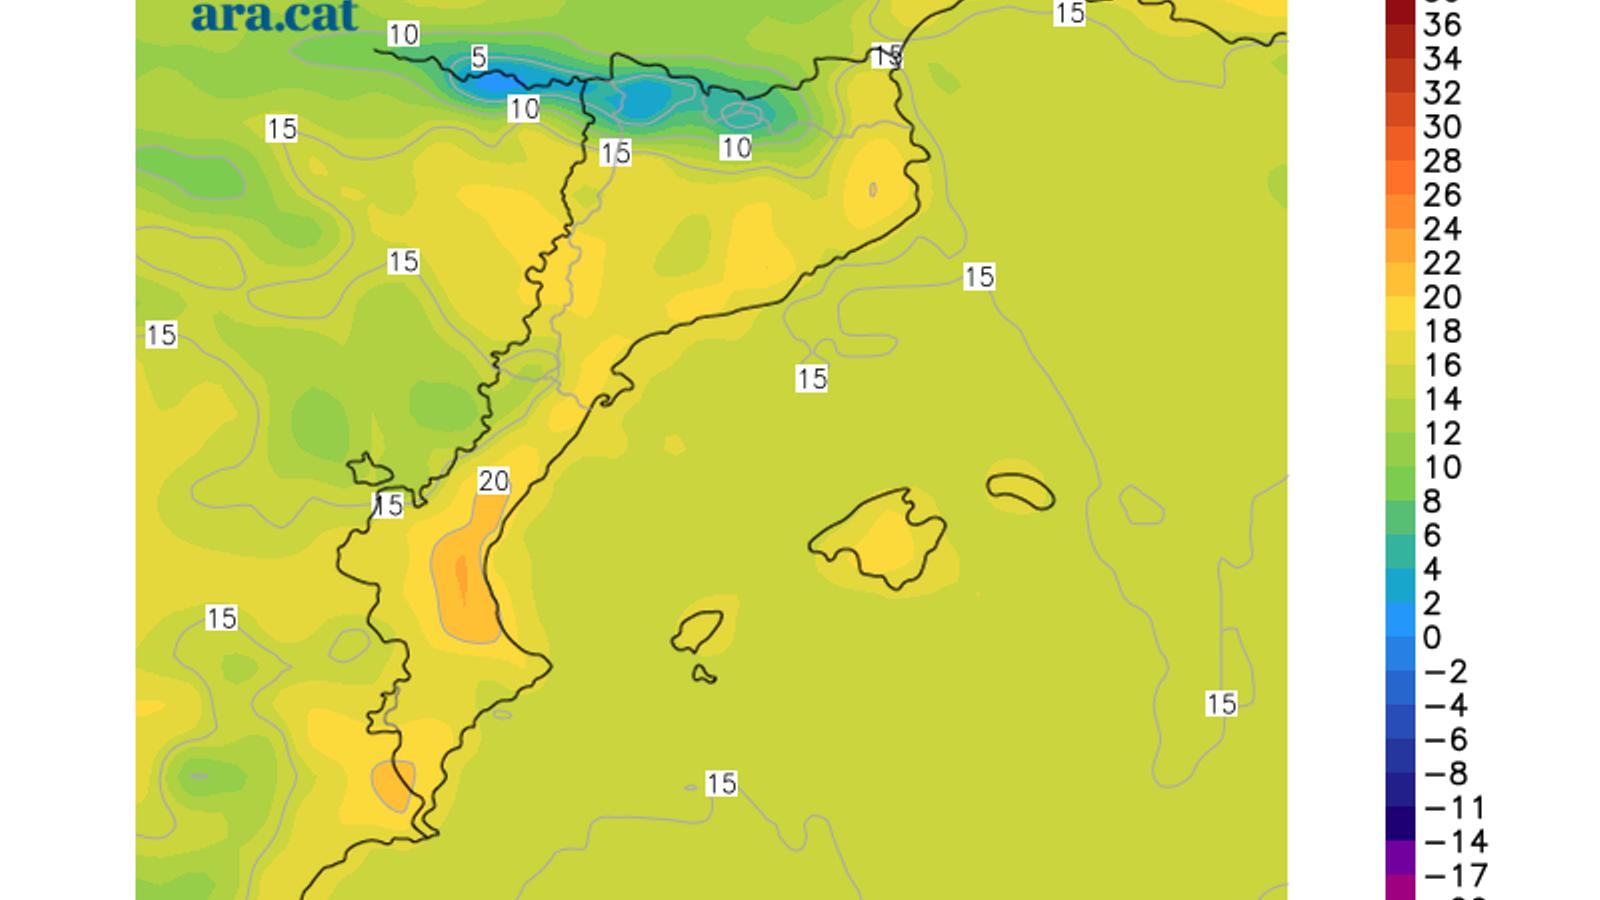 Temperatura màxima prevista per avui